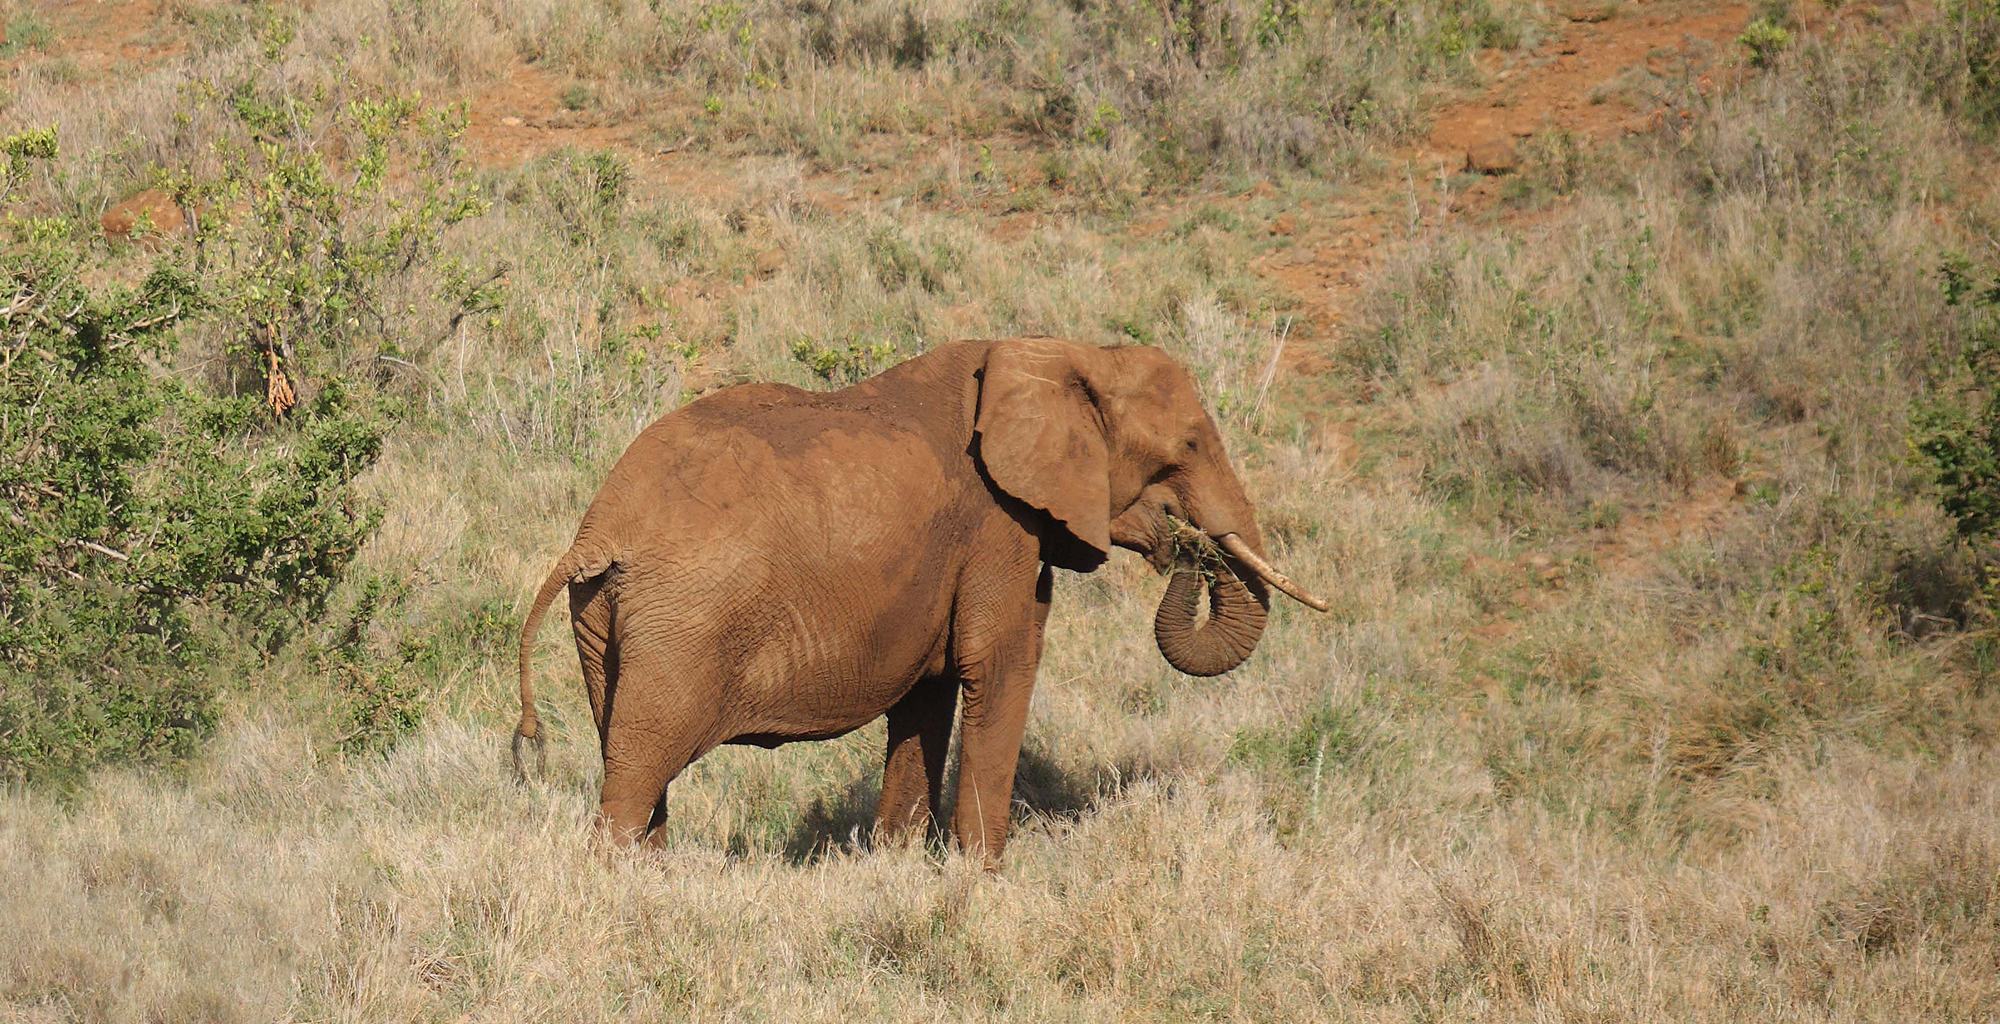 Kenya-Sirikoi-Willies-Camp-Elephant